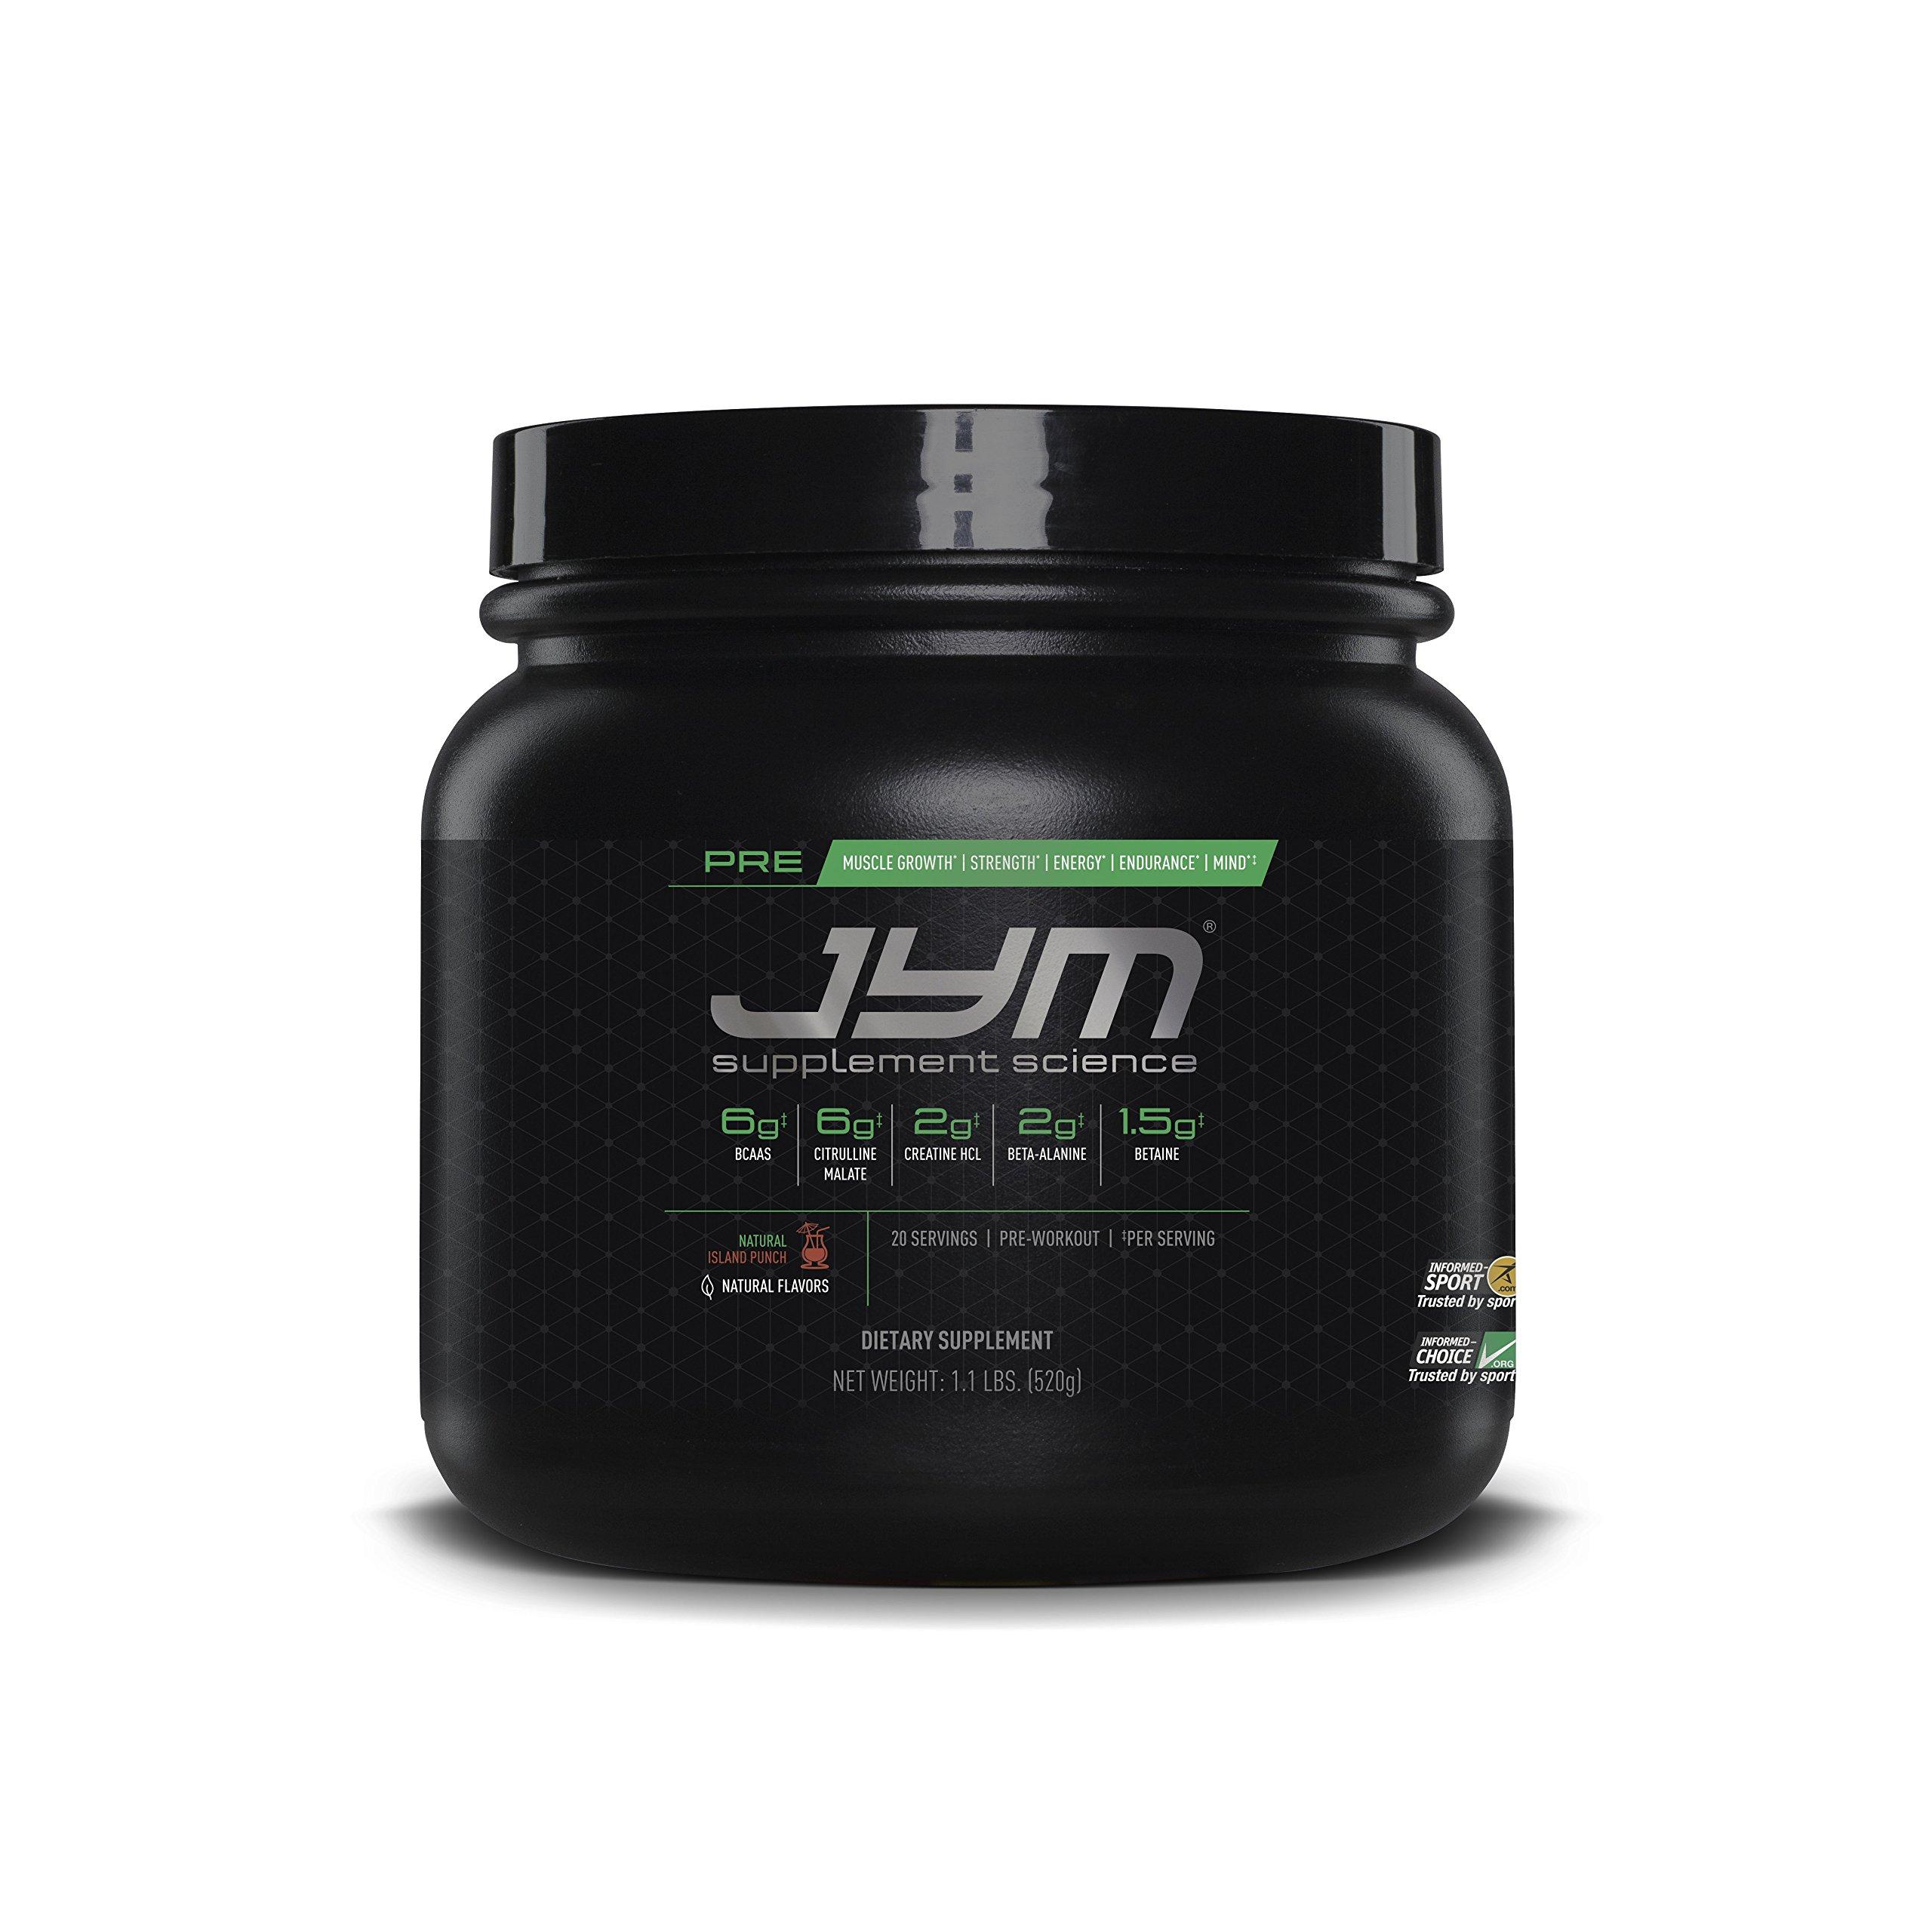 Amazon.com: JYM Supplement Science, POST JYM Active Matrix, Post-Workout with BCAA's, Glutamine